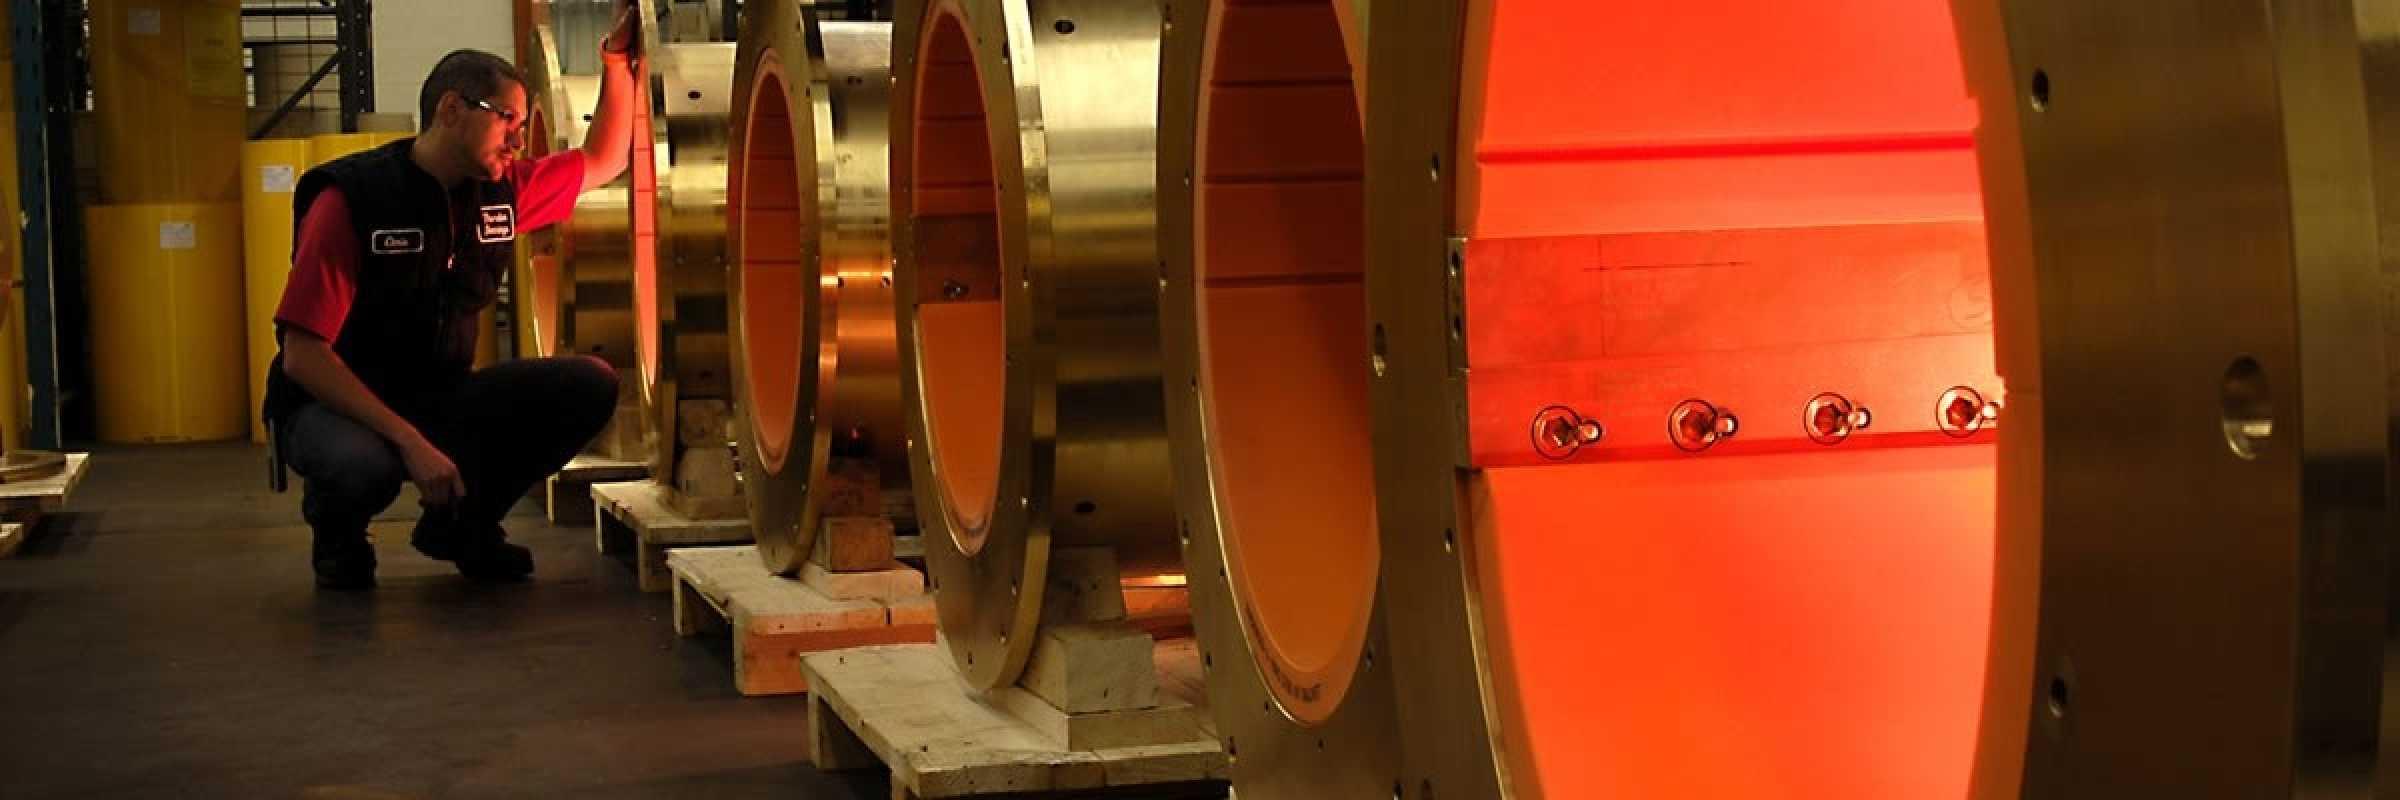 Coast guard solves vibration problem with Thordon propeller shaft bearing system